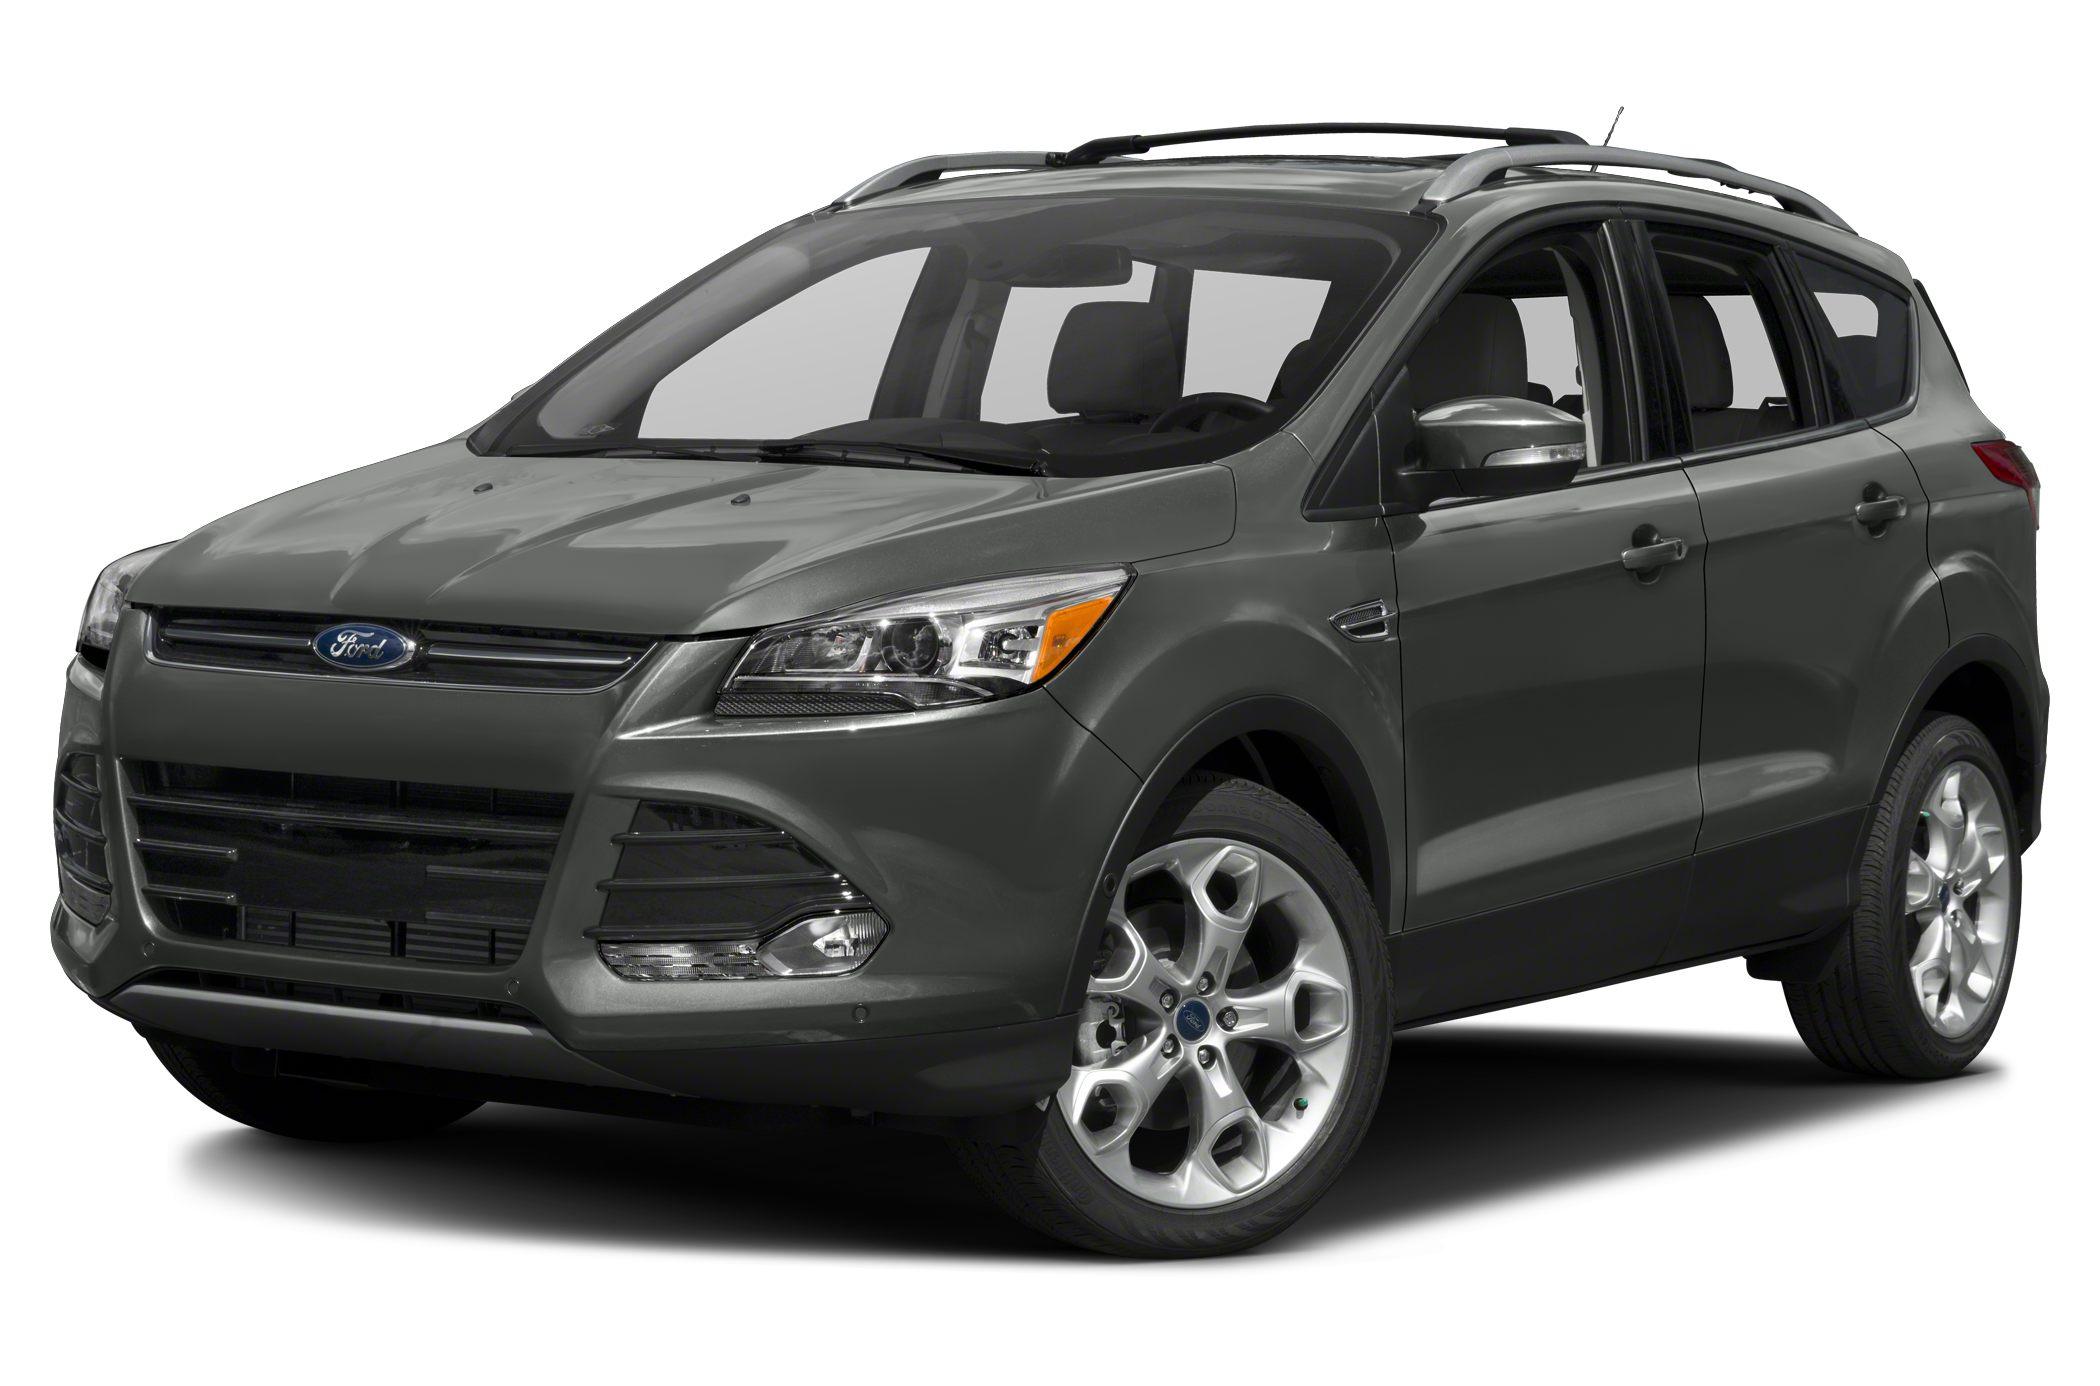 2016 Ford Escape Titanium Color White Stock 18209 VIN 1FMCU9J99GUB18209